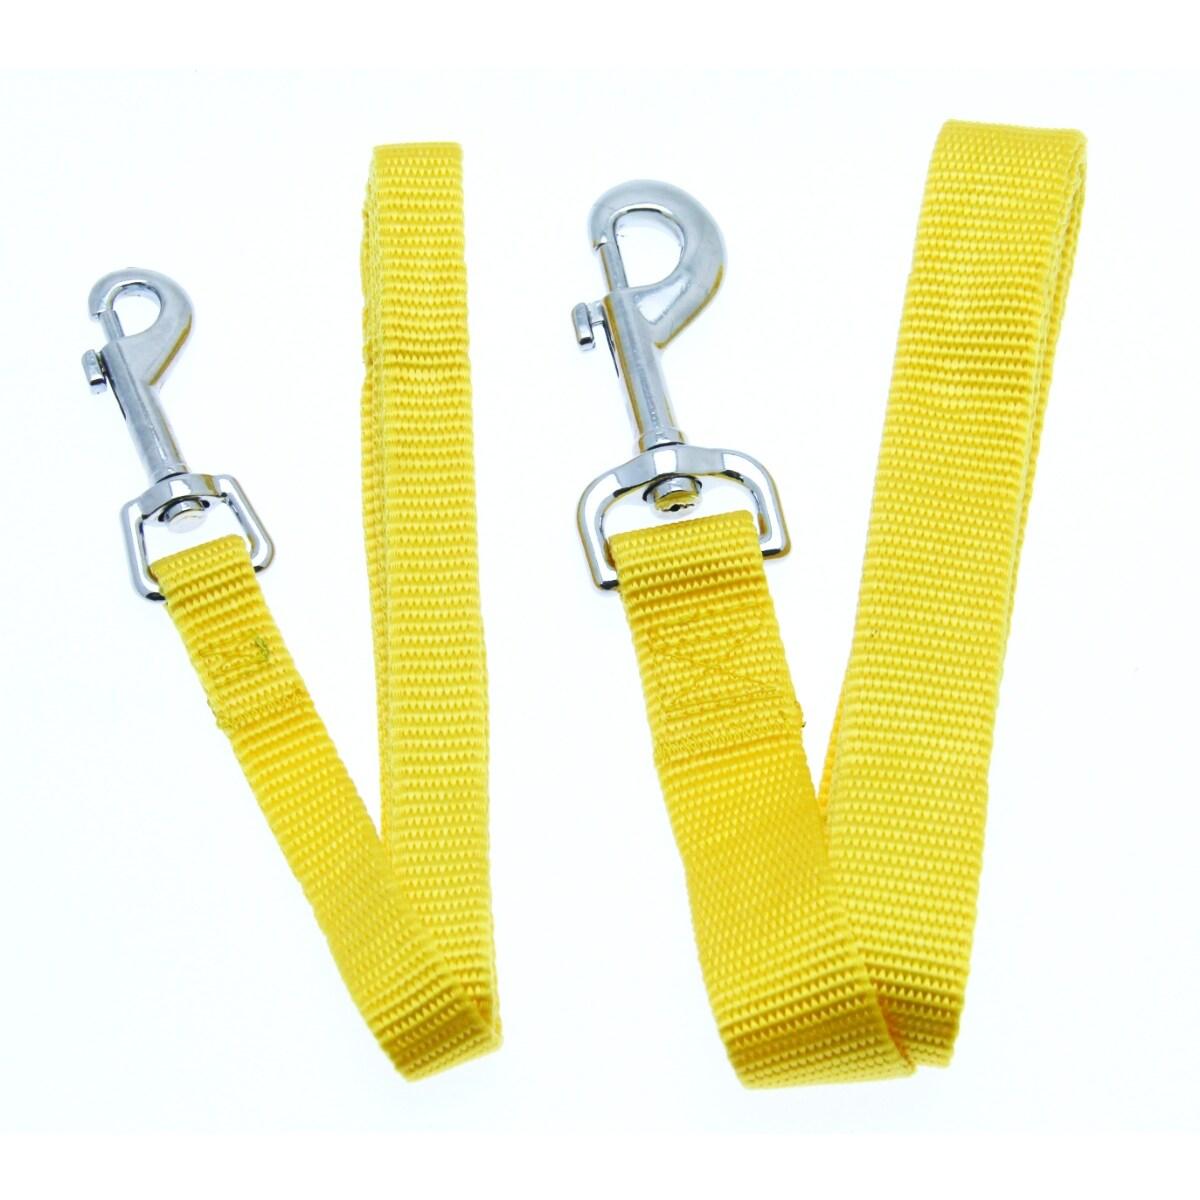 Barking Basics Dog Leash - Yellow (Yellow - 5/8 x 4 Length)